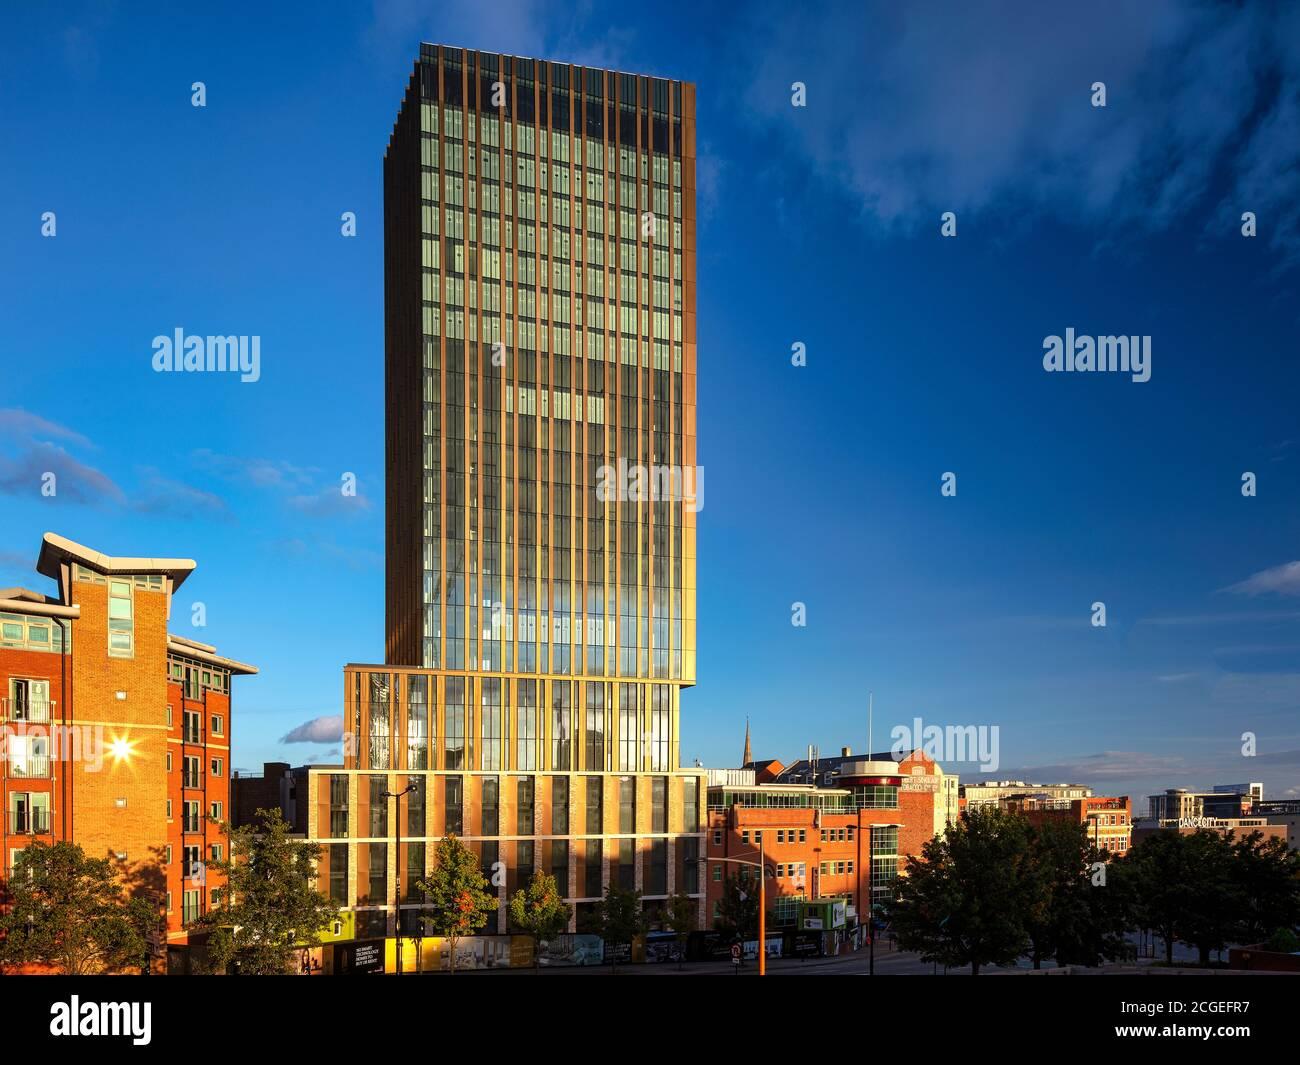 Evening light over Hadrian Tower, Newcastle upon Tyne, Tyne and Wear, England, United Kingdom Stock Photo